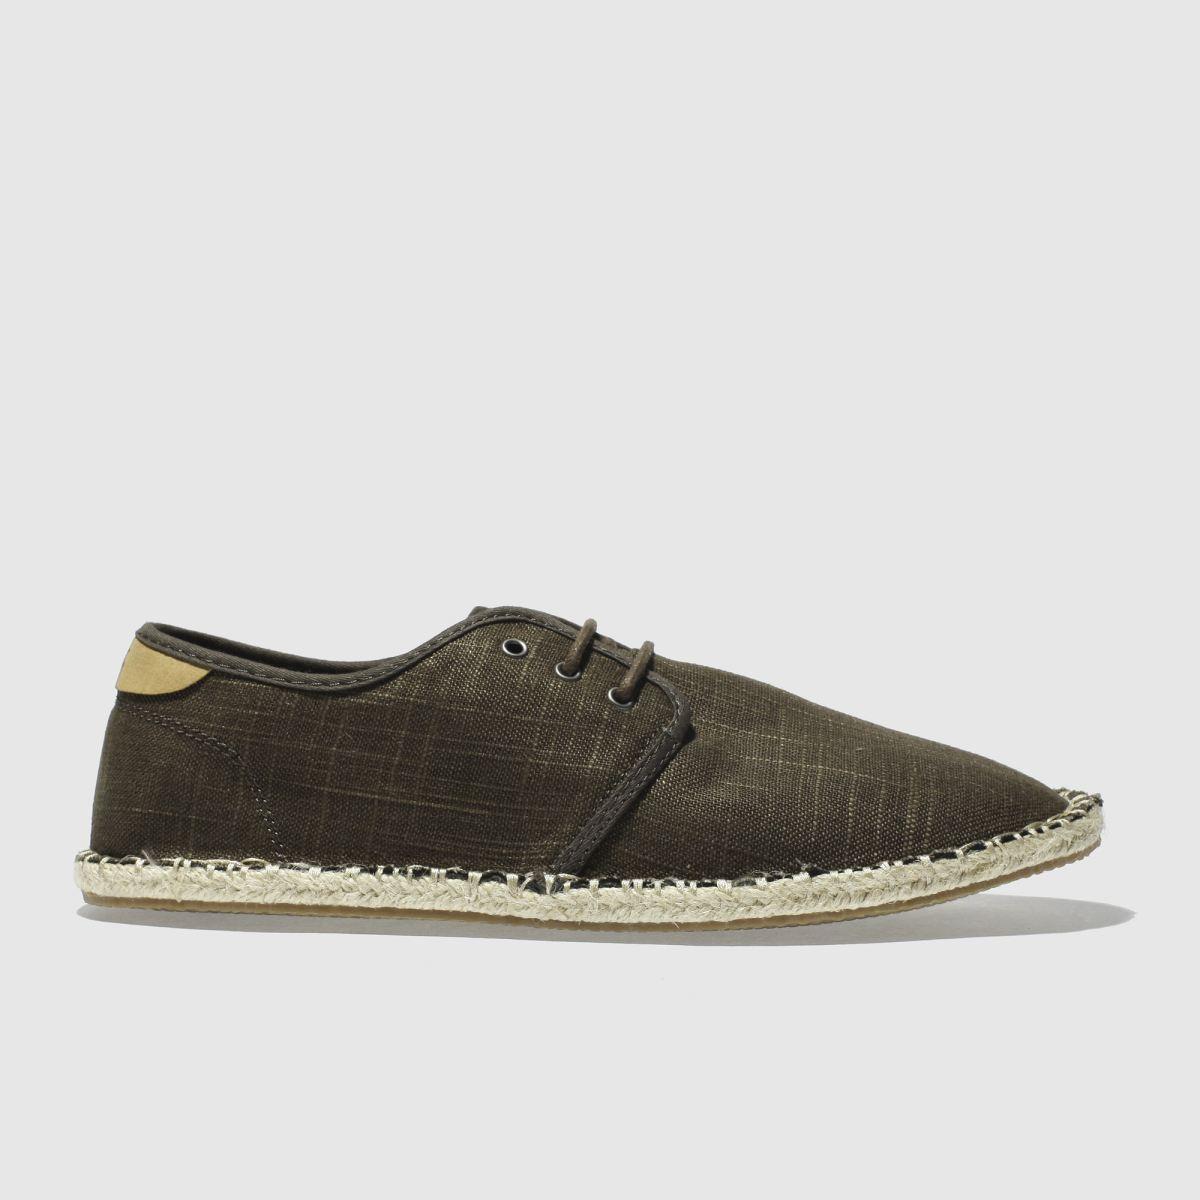 Toms Khaki Diego Shoes